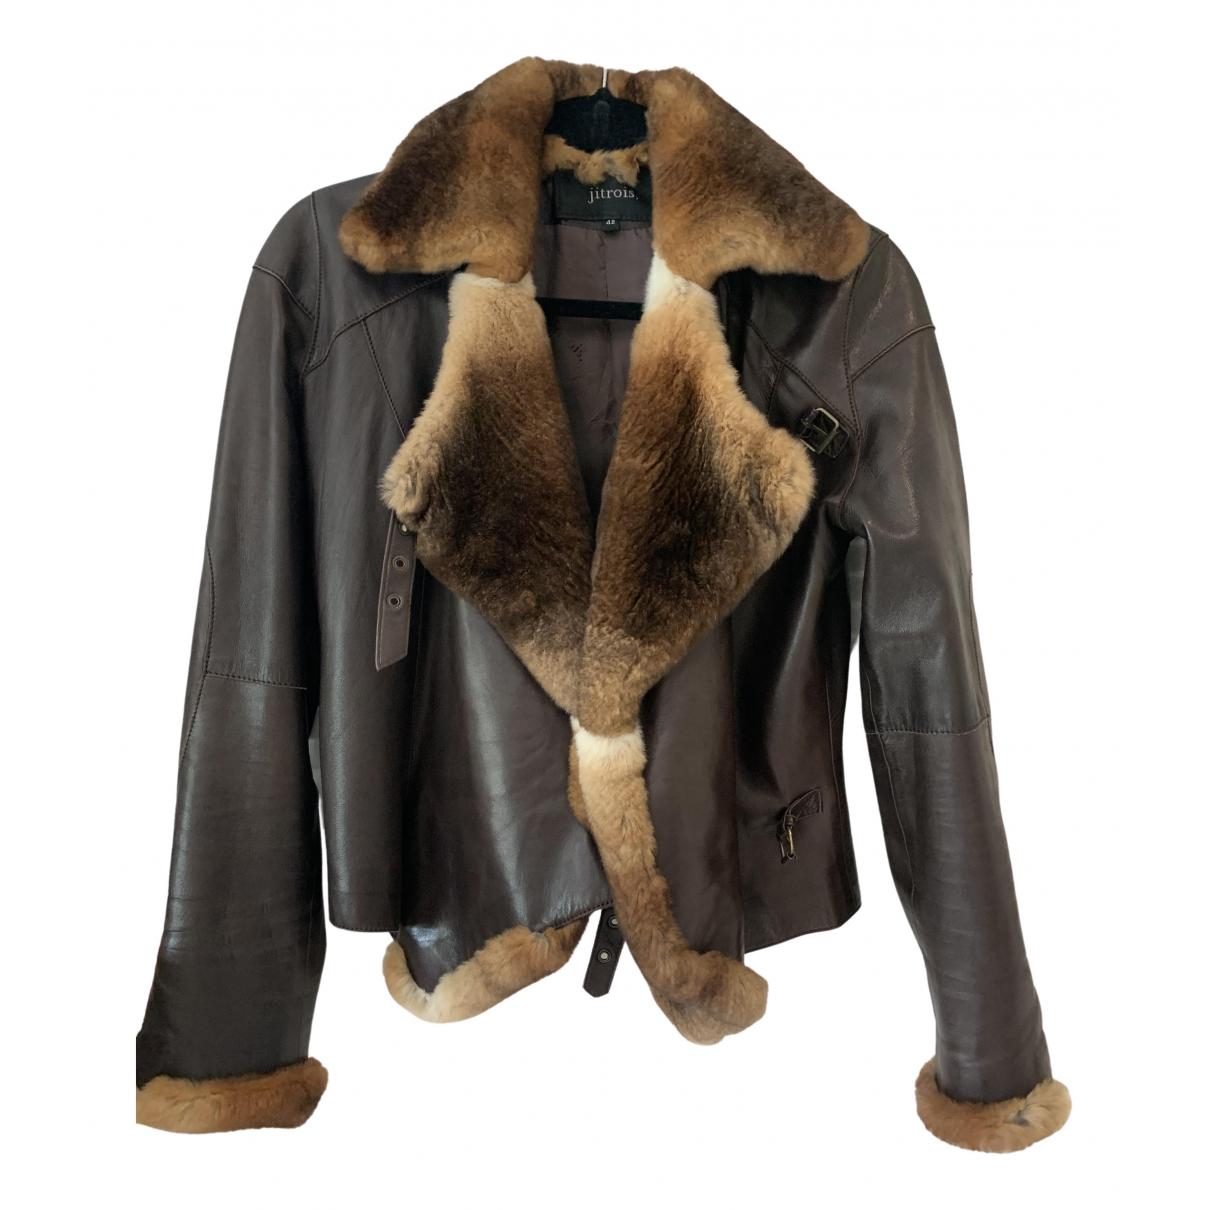 Jitrois \N Brown Fur jacket for Women 42 FR